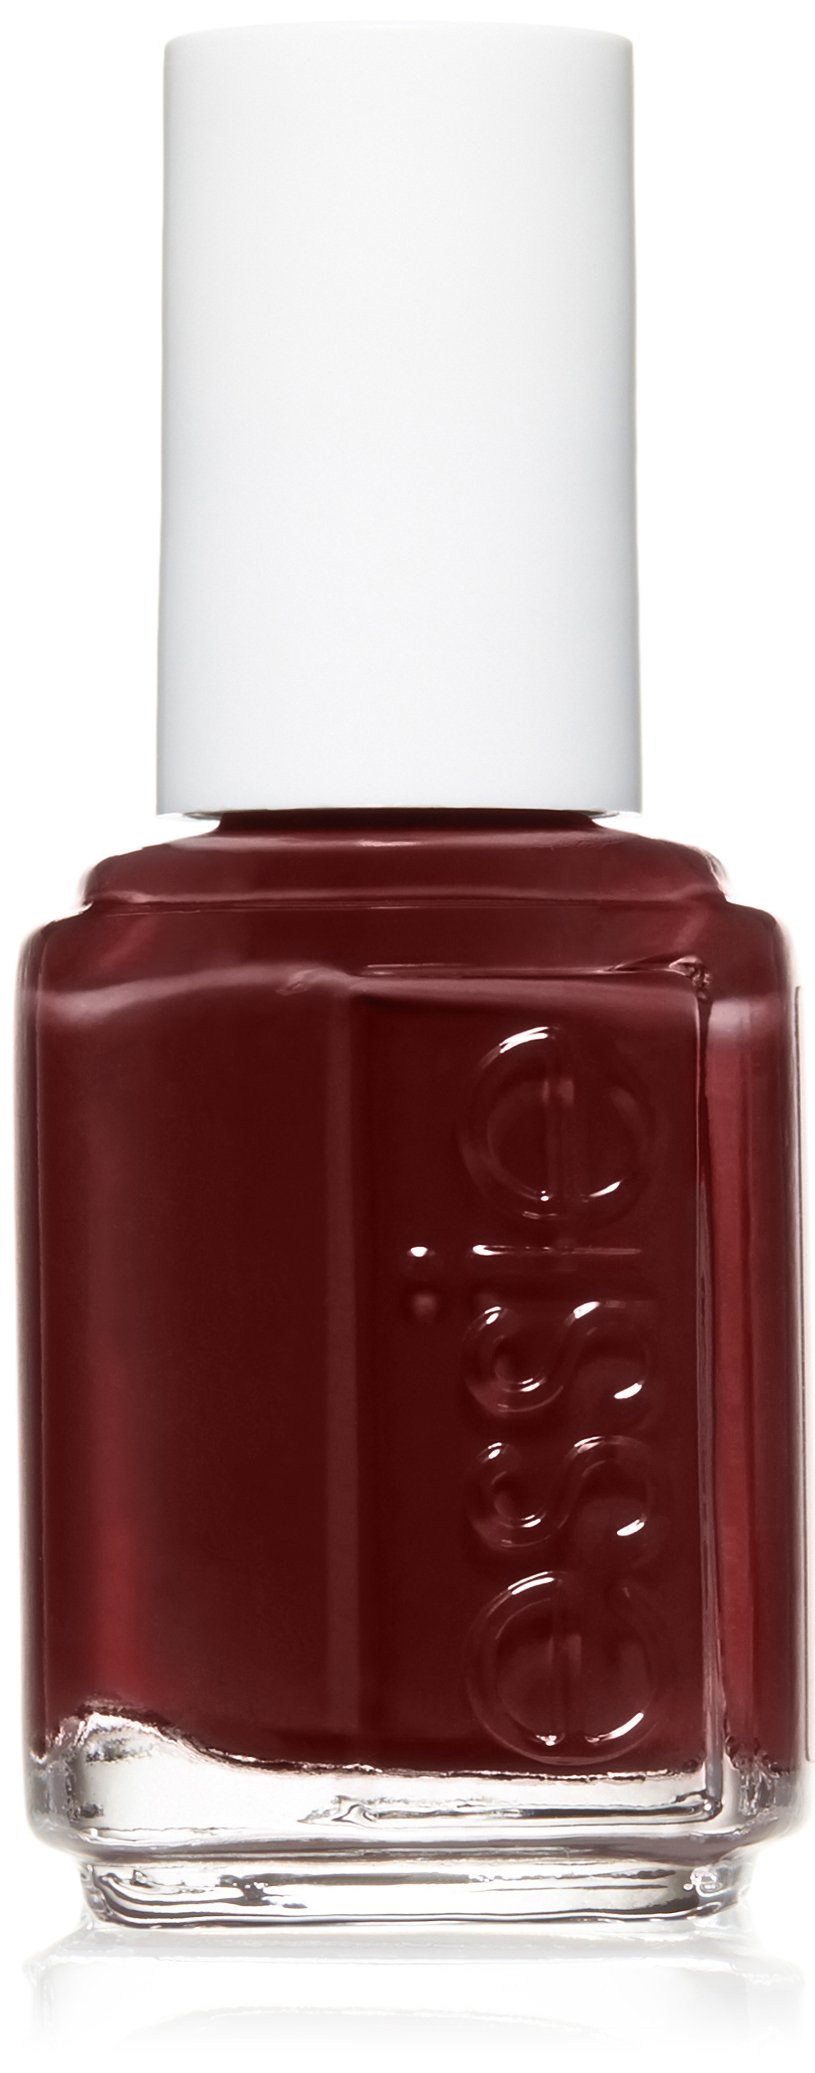 Amazon.com : essie nail polish, wicked, deep red nail polish, 0.46 ...